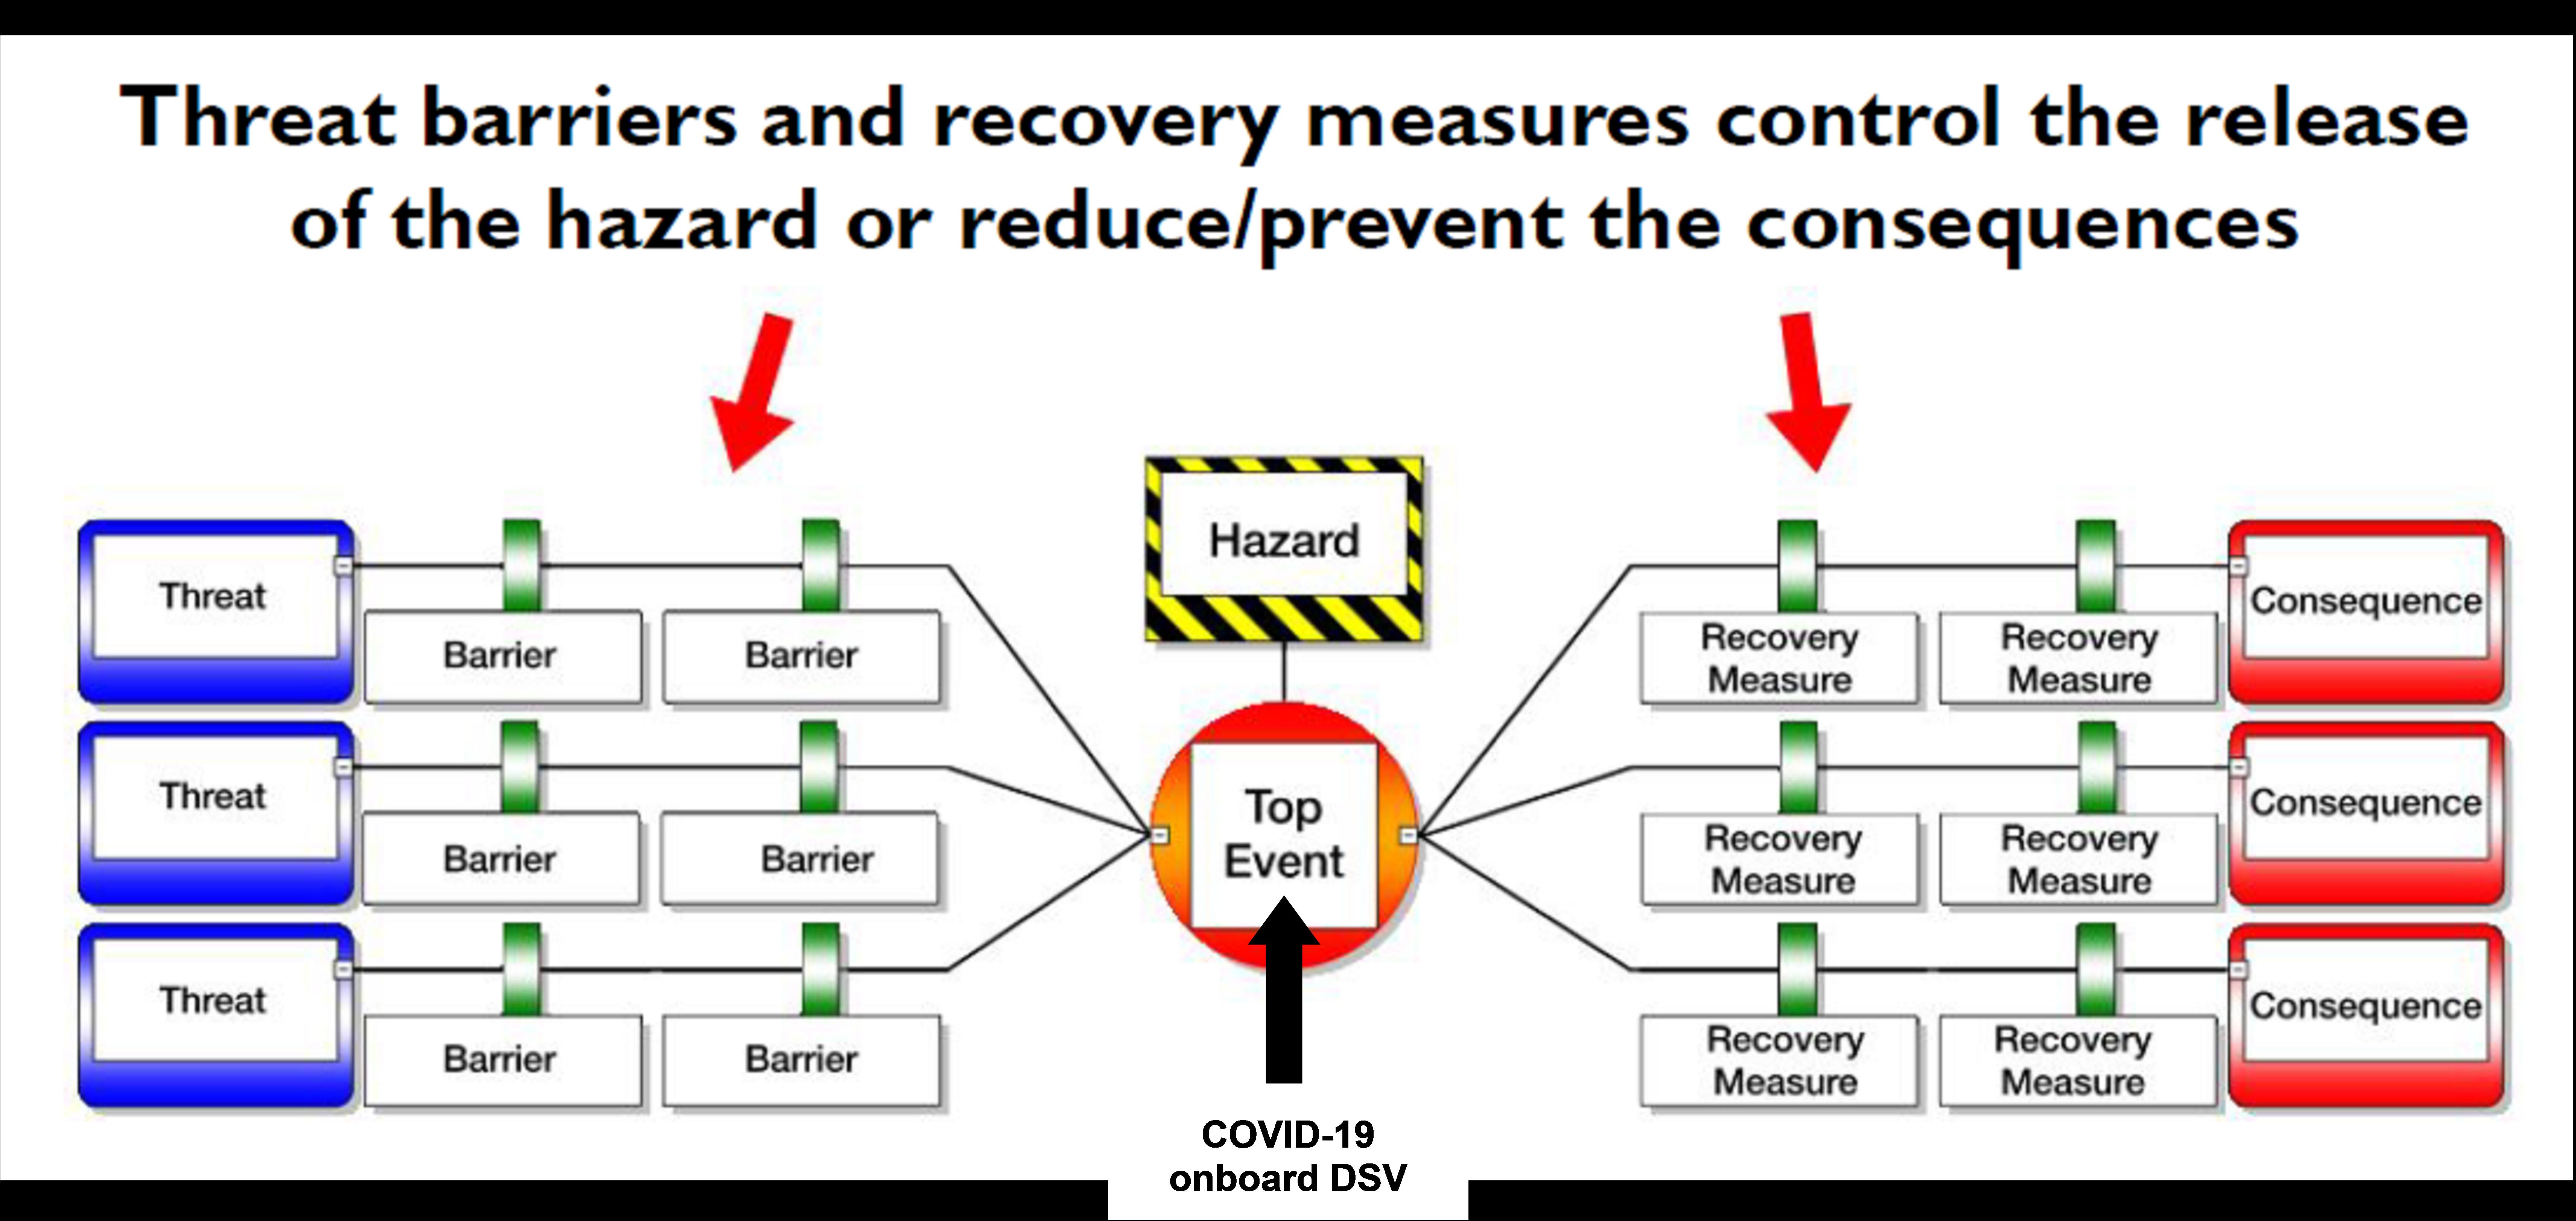 Covid 19 An Example Of A Risk Assessment Undertaken By An Imca Diving Contractor Imca Hazard assessment description of work area: imca